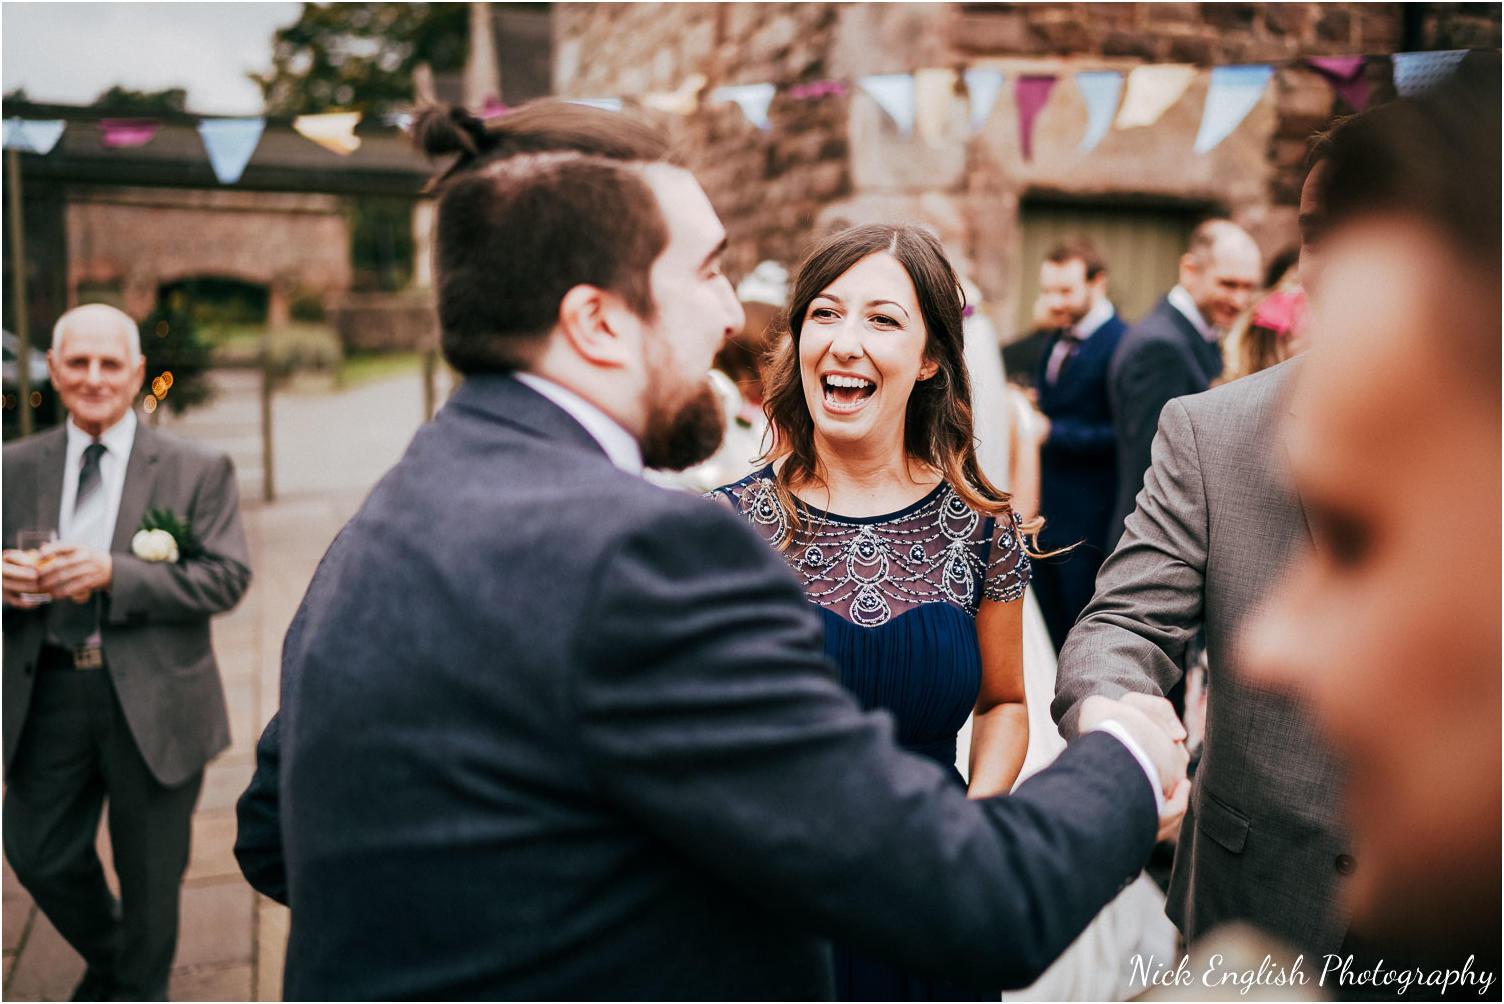 The_Ashes_Barn_Endon_Stoke_Wedding_Photographer-49.jpg